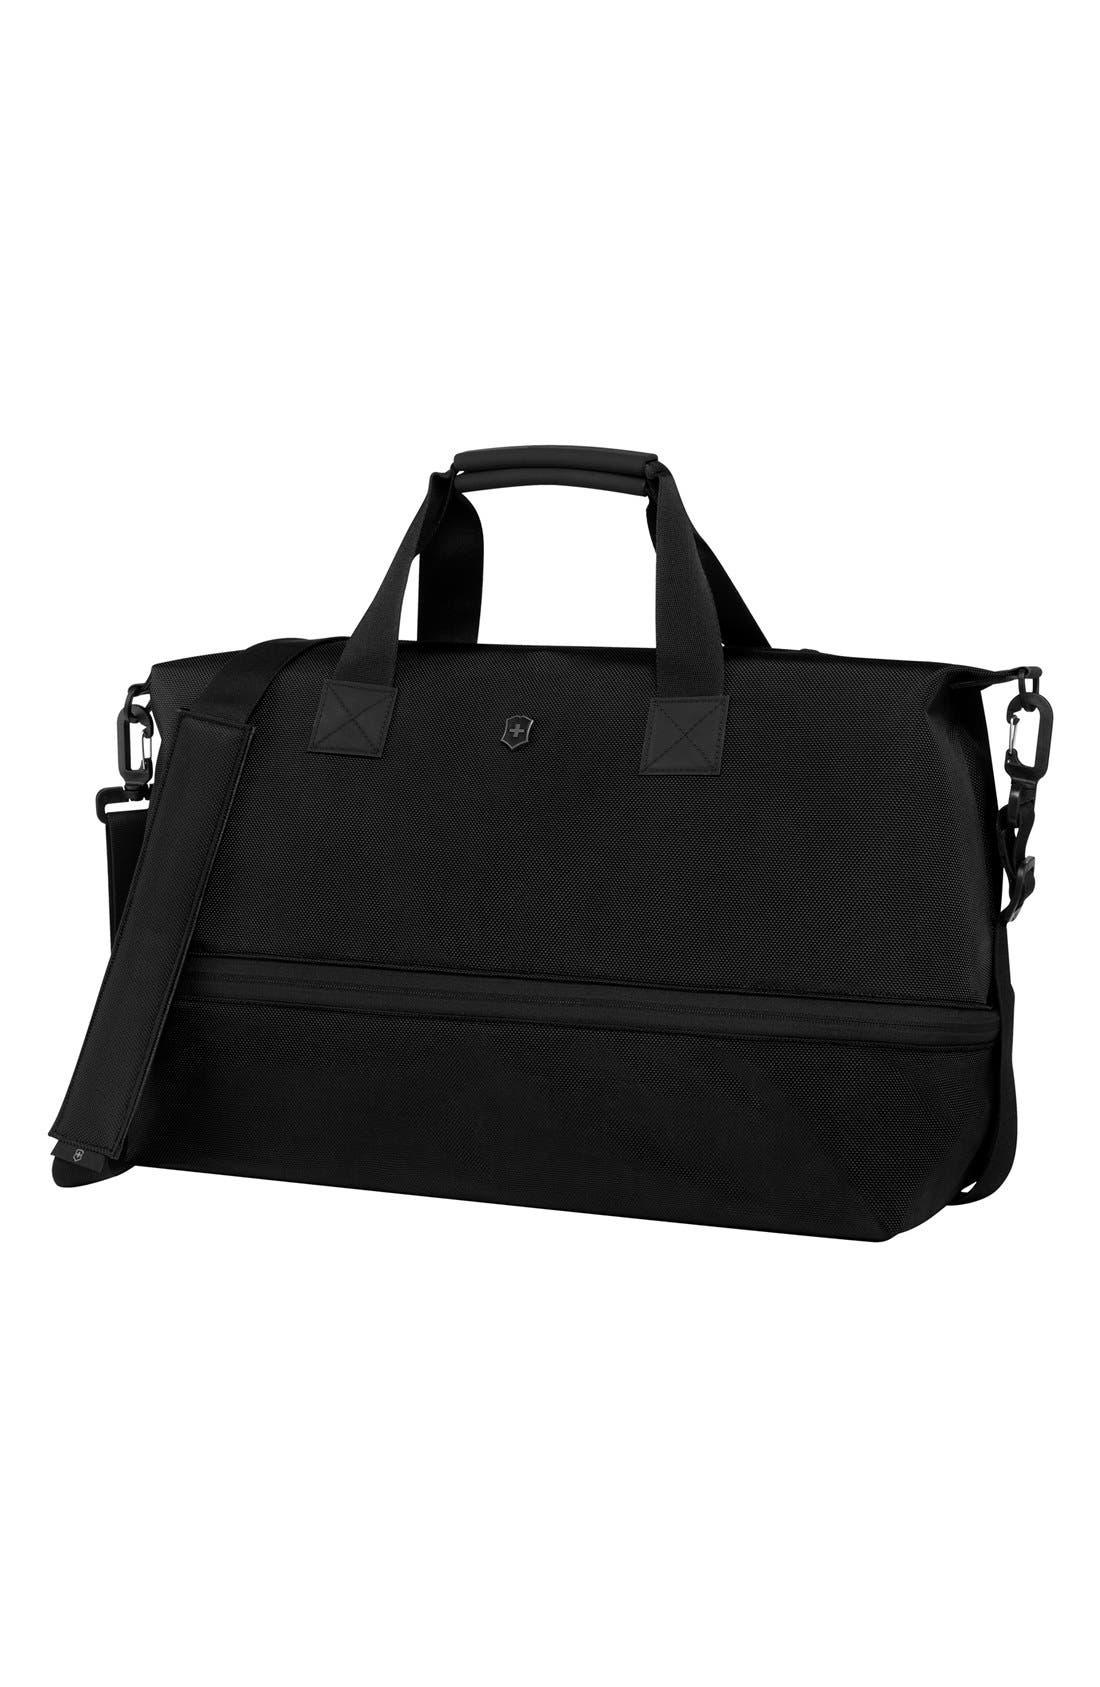 Duffel Bag,                             Main thumbnail 1, color,                             Black